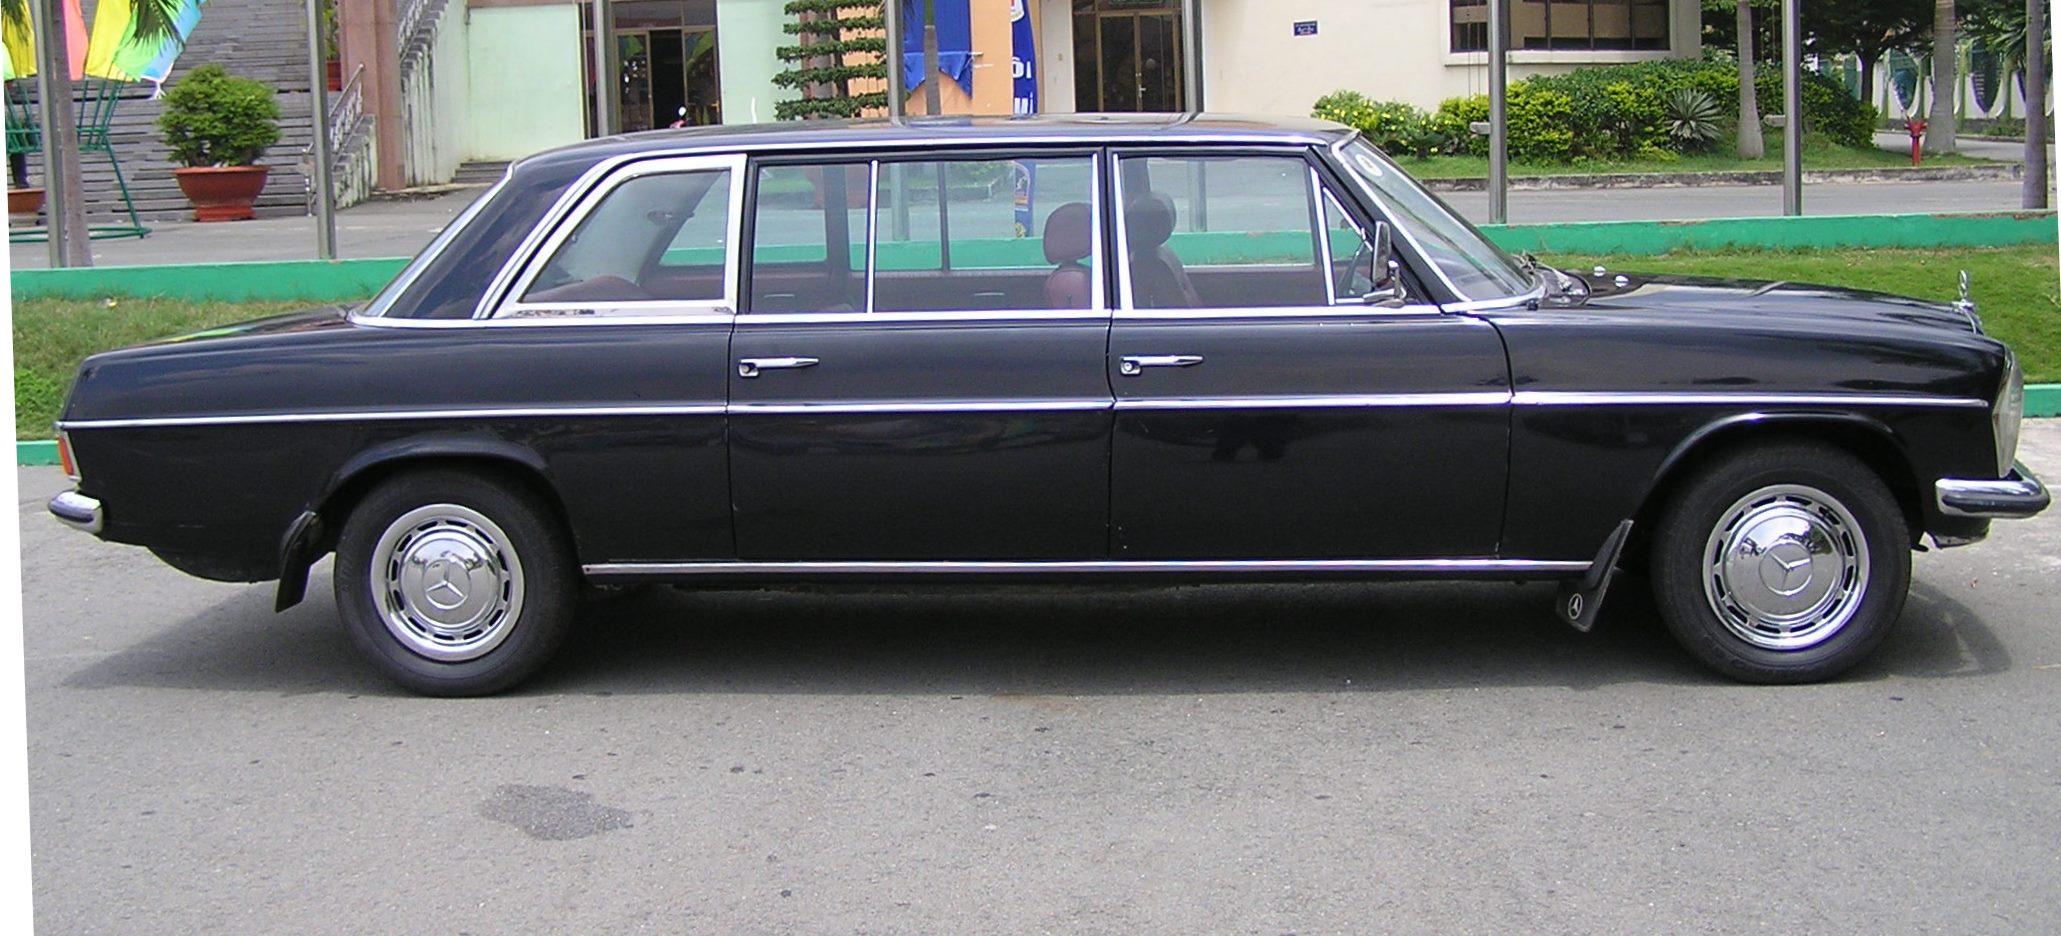 Trai-nghiem-qua-khu-ngot-ngao-tren-Mercedes-Benz-Limousine-230E-1969-anh-2